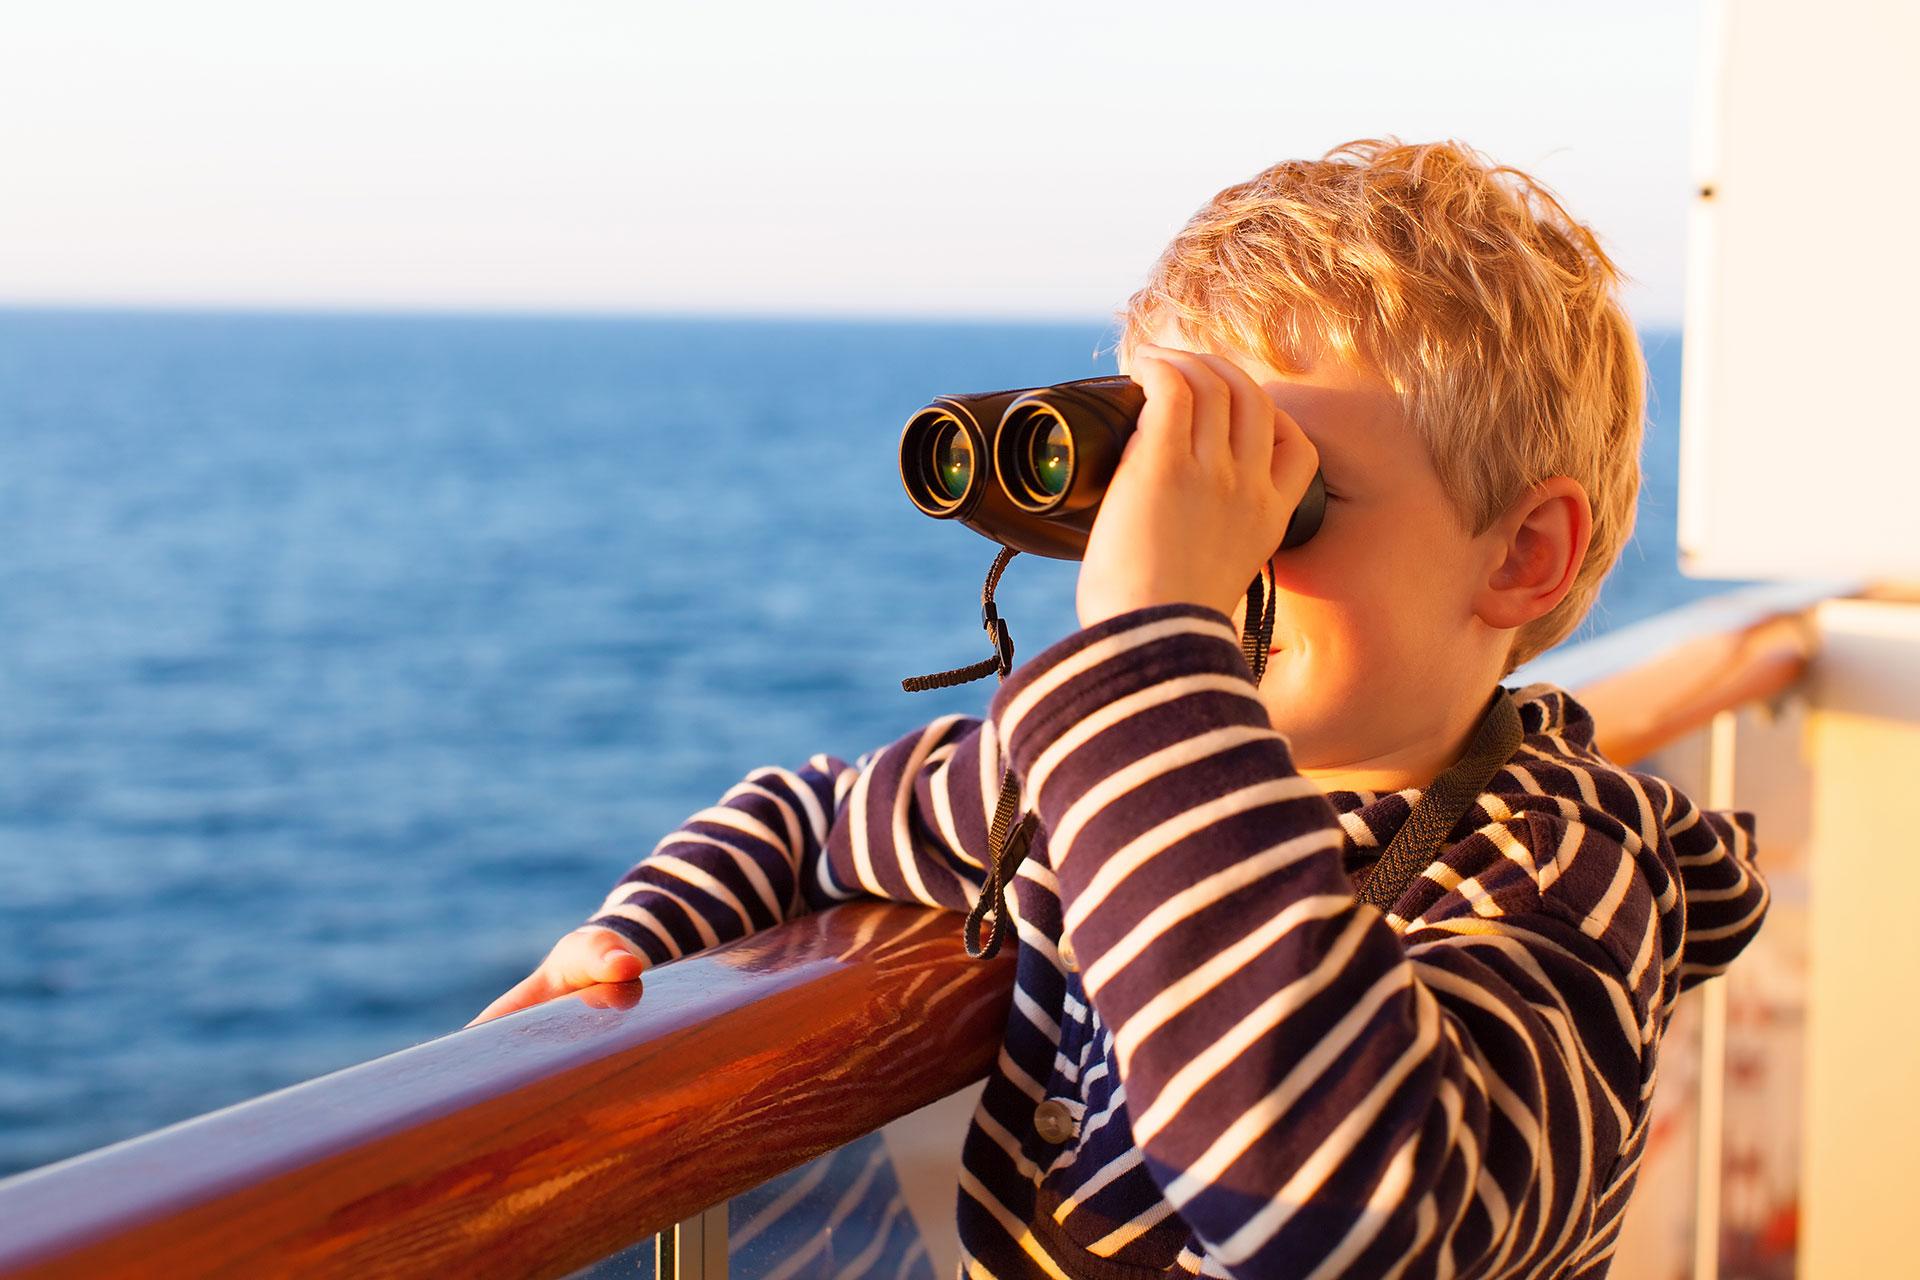 Young Boy With Binoculars on Cruise